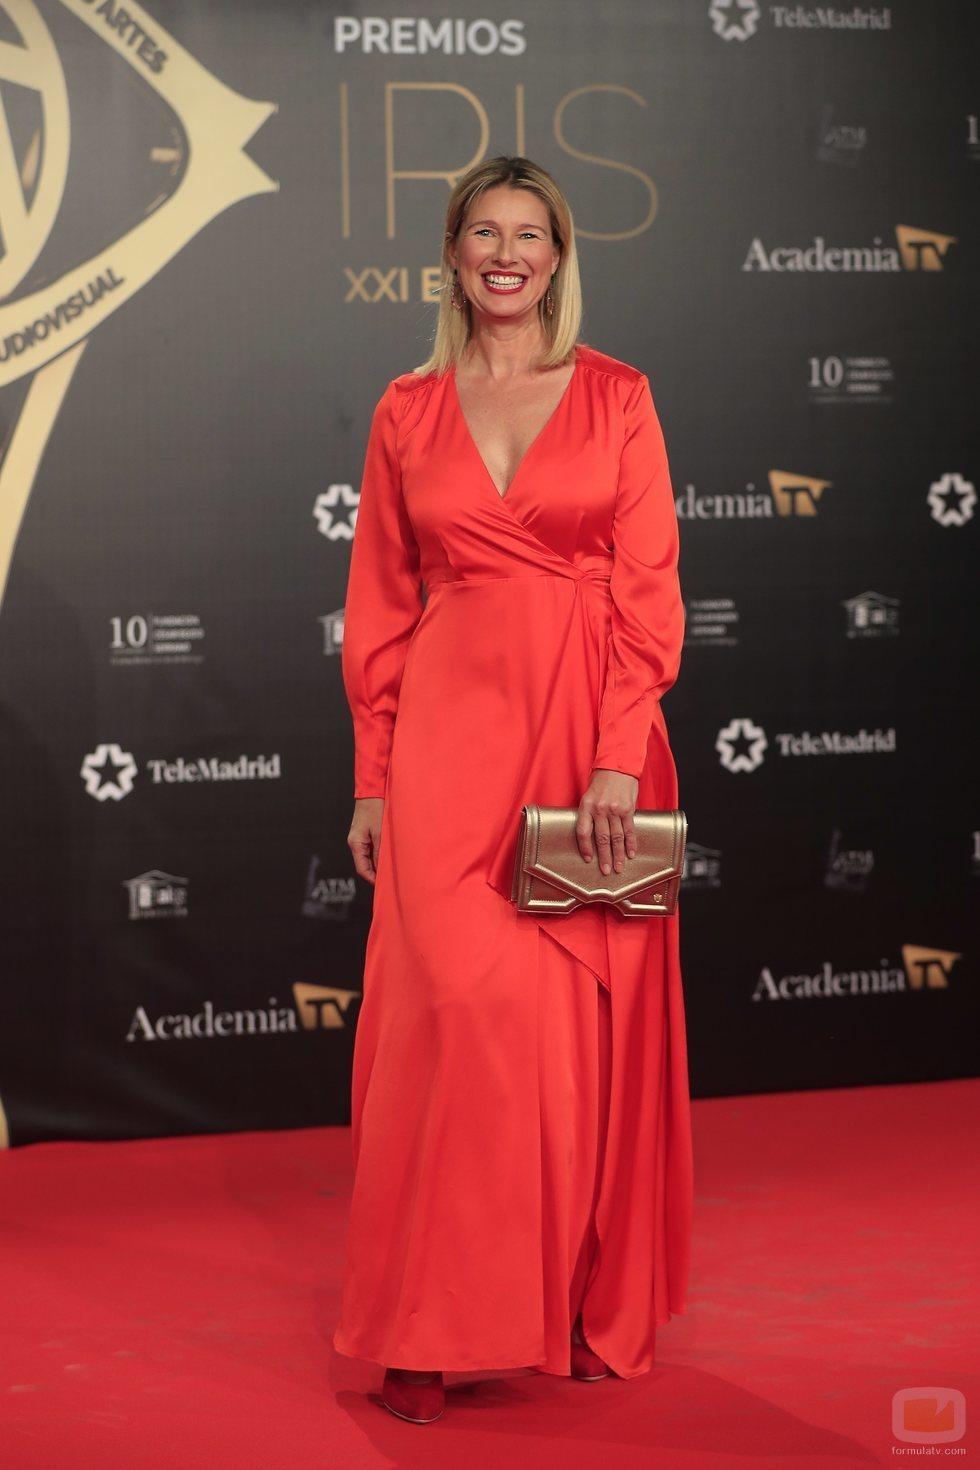 Anne Igartiburu posa sonriente en los Premios Iris 2019